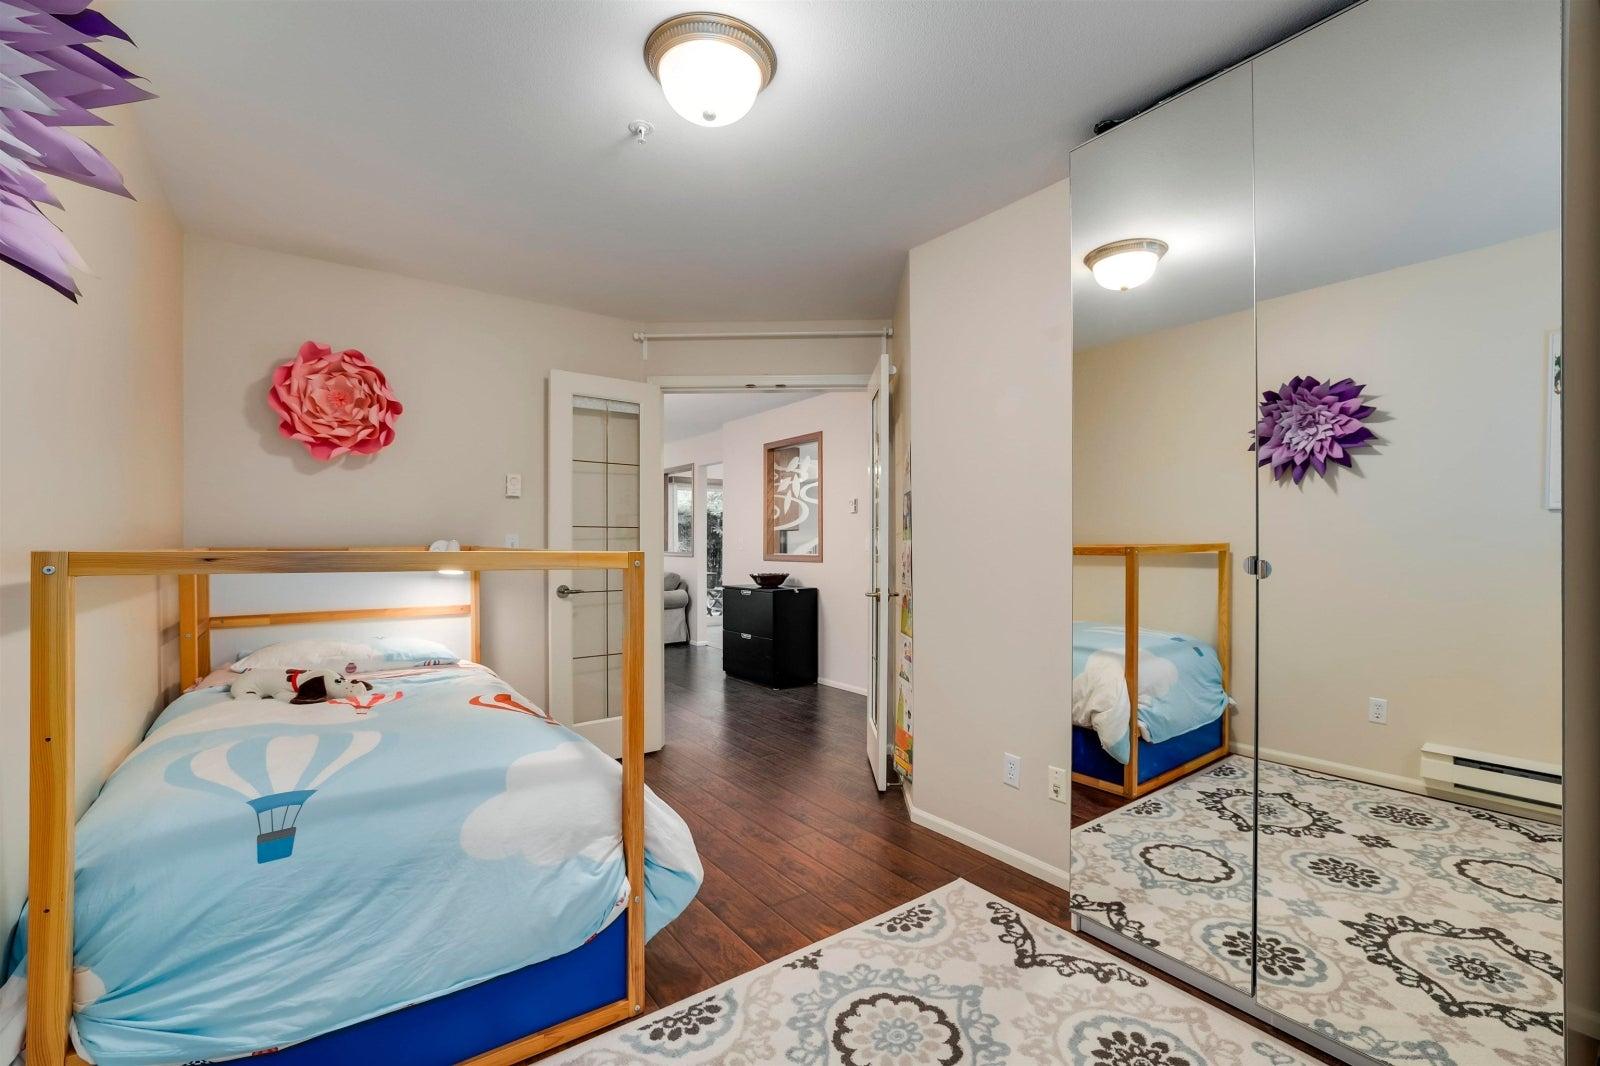 103 1132 DUFFERIN STREET - Eagle Ridge CQ Apartment/Condo for sale, 2 Bedrooms (R2618654) #21